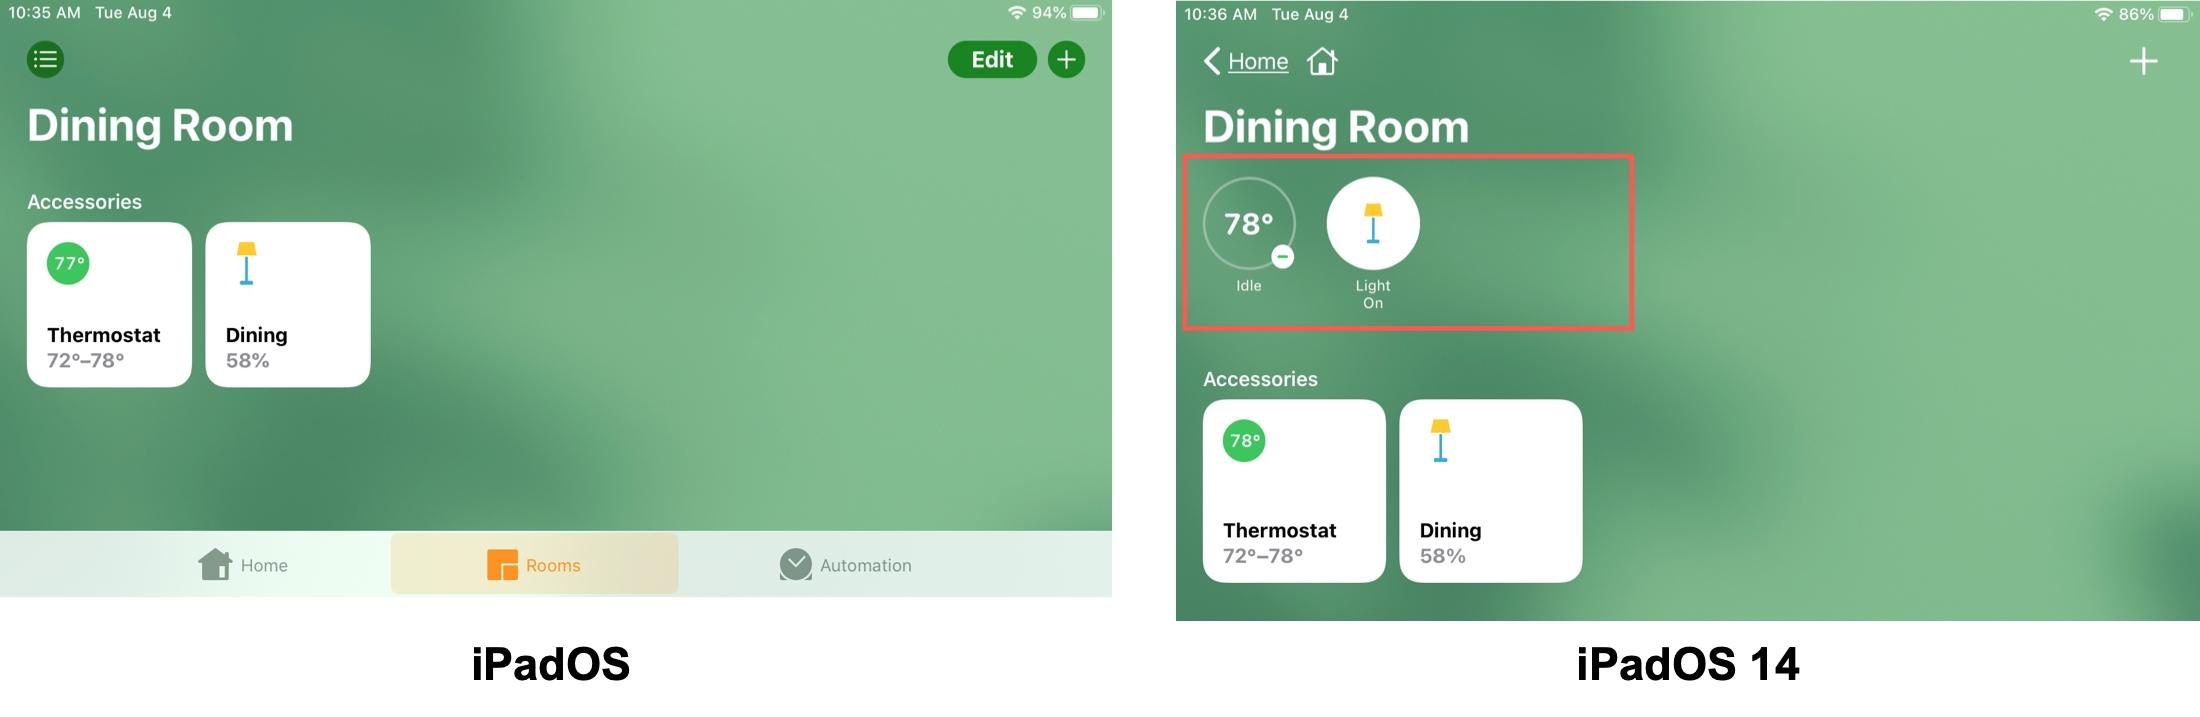 Room Status iPadOS vs iPadOS 14